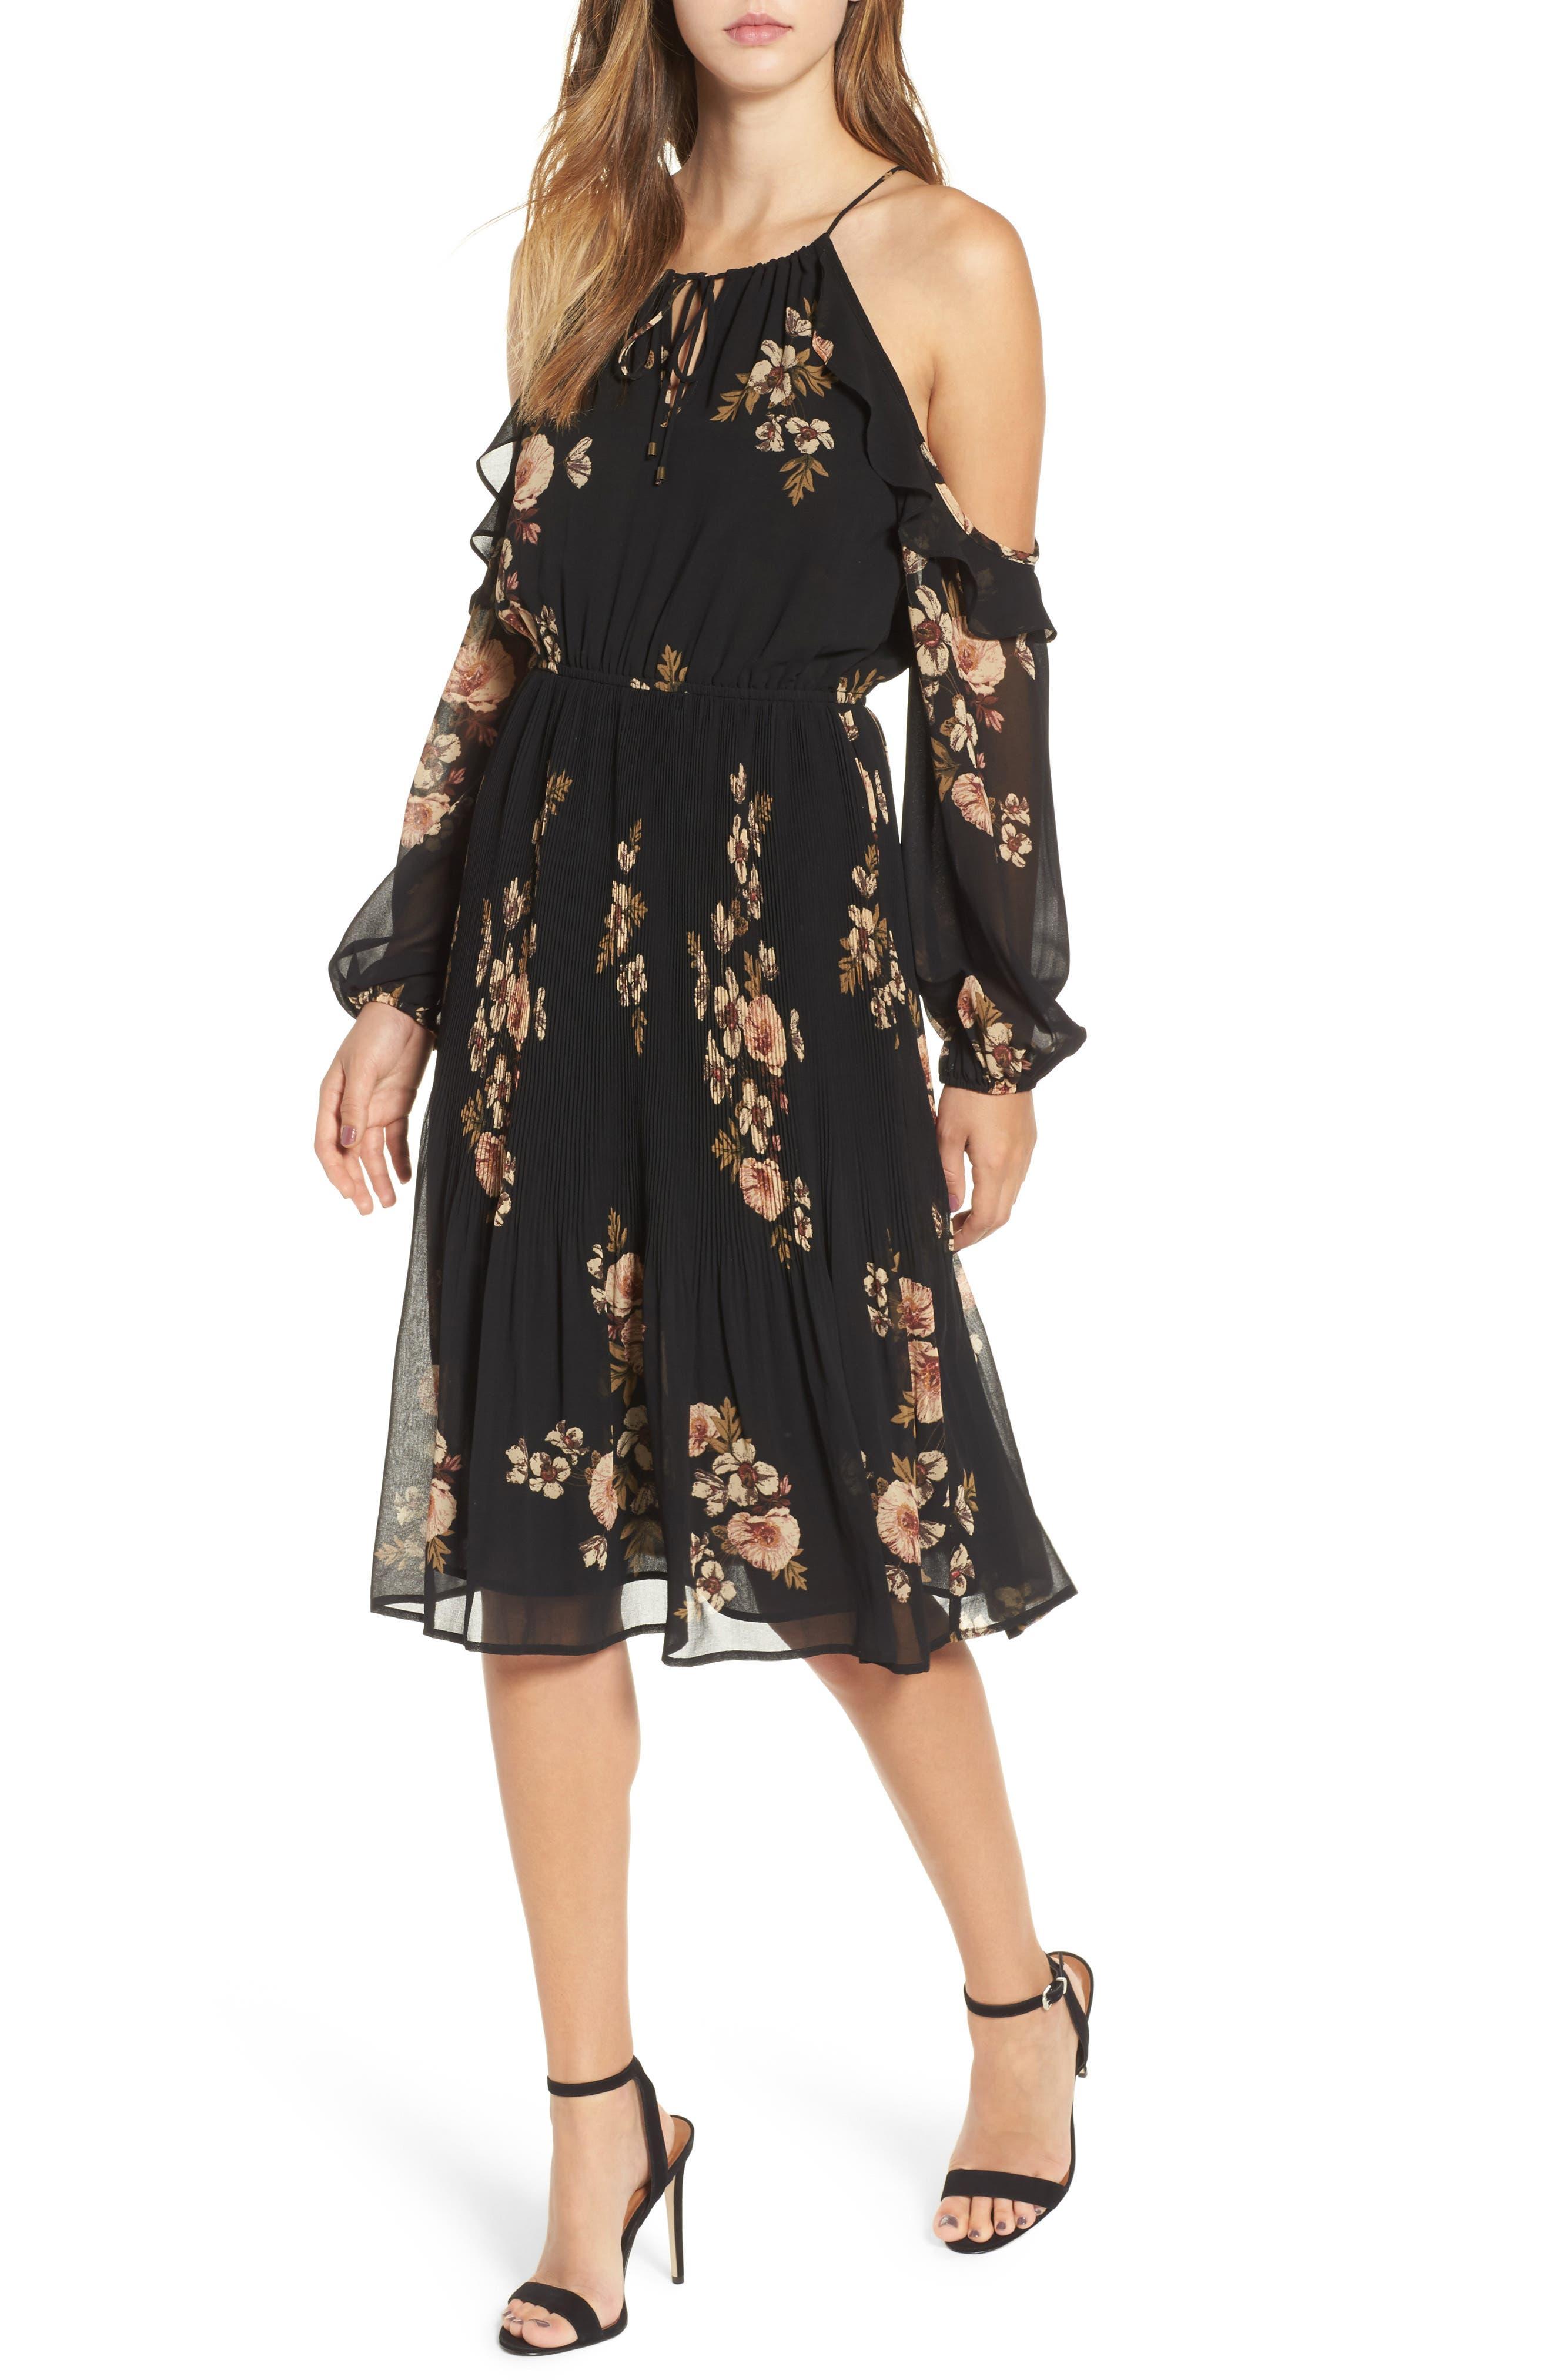 Main Image - ASTR the Label Persephone Cold Shoulder Dress